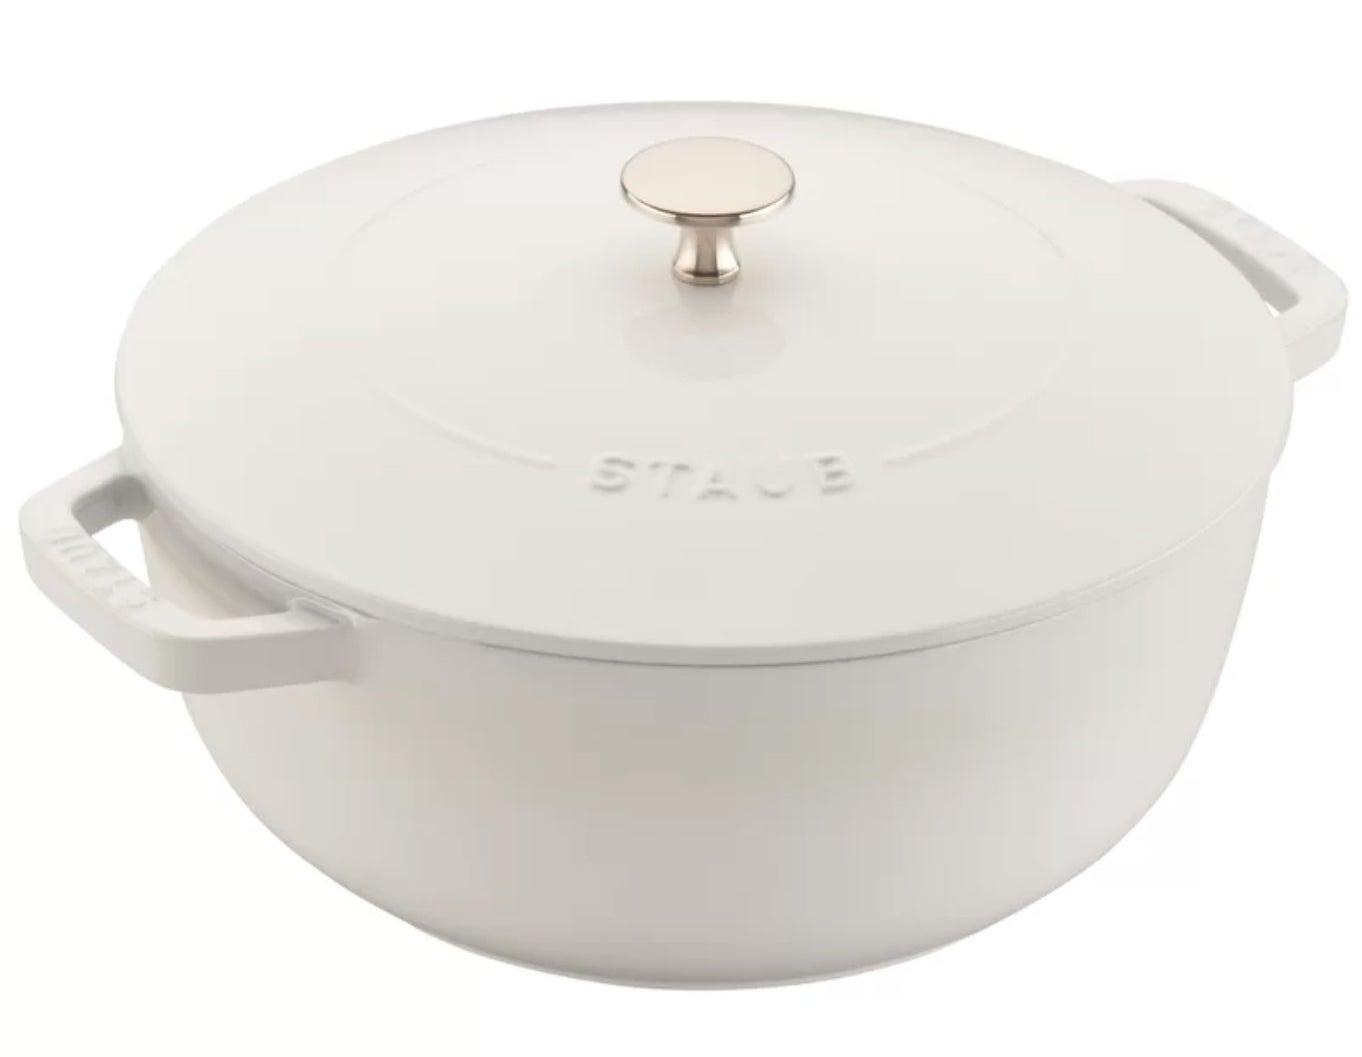 The white cast iron round dutch oven